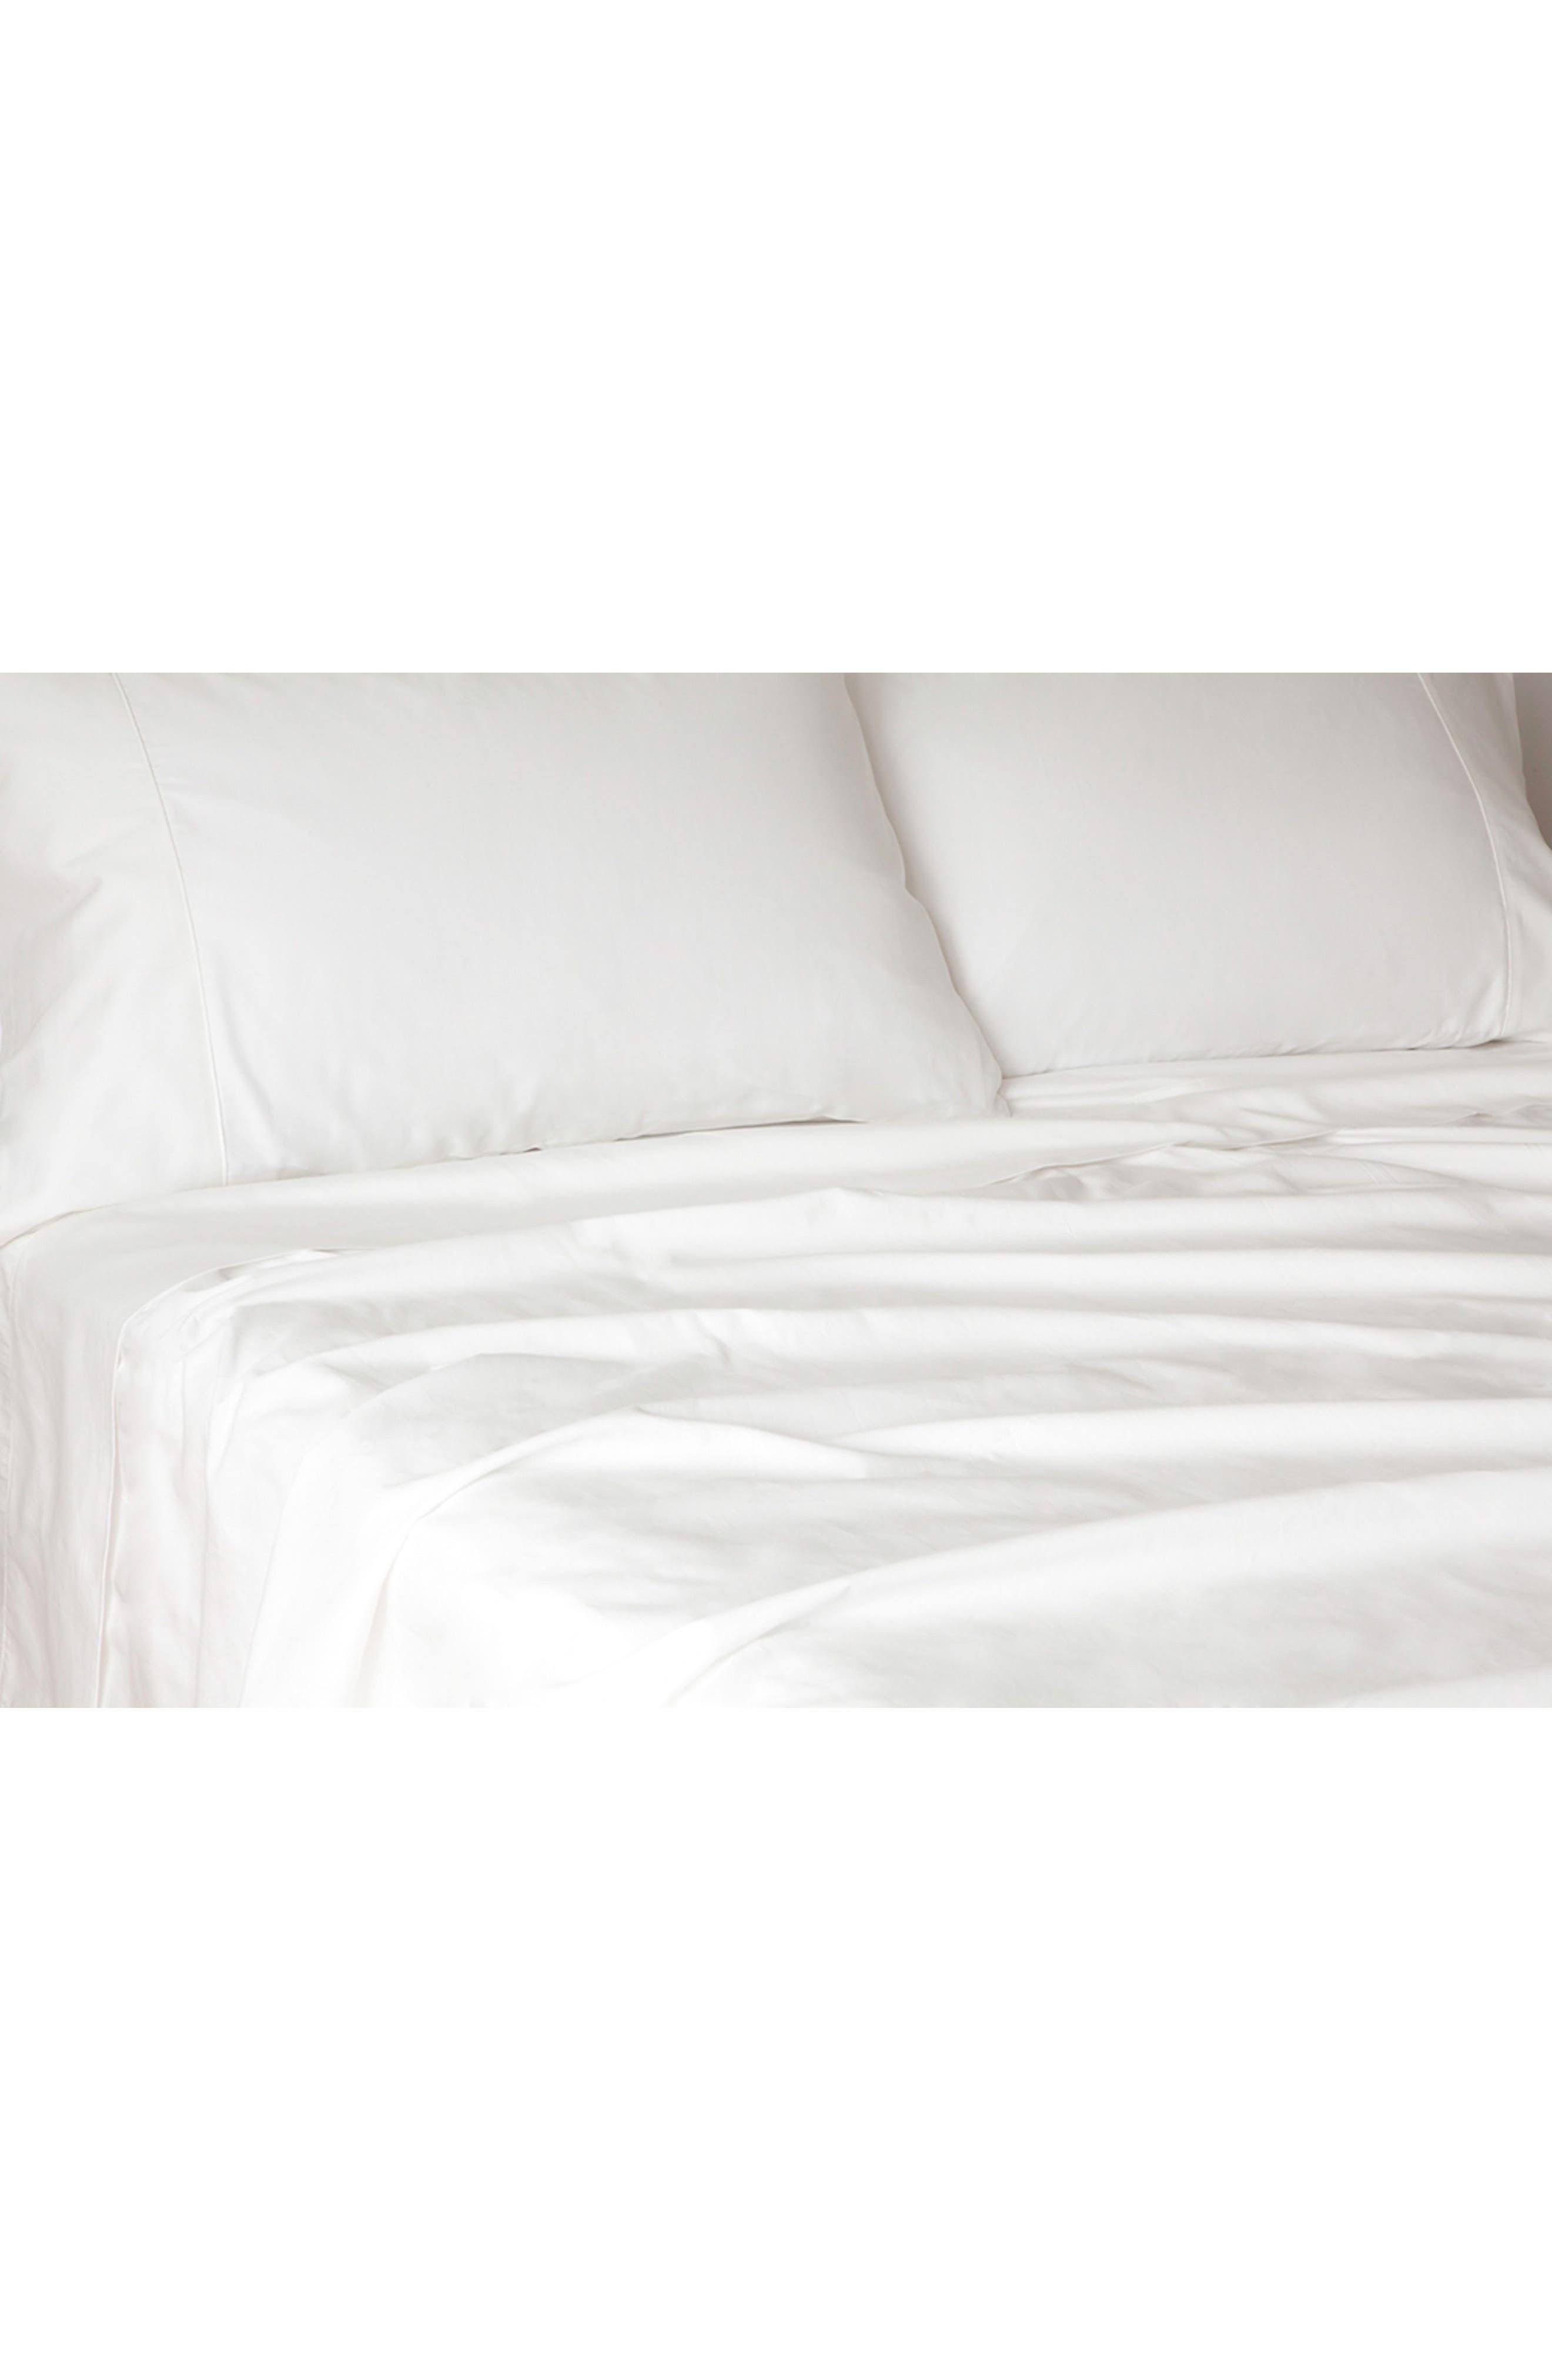 300 Thread Count Organic Cotton Sateen Sheet Set,                         Main,                         color, White